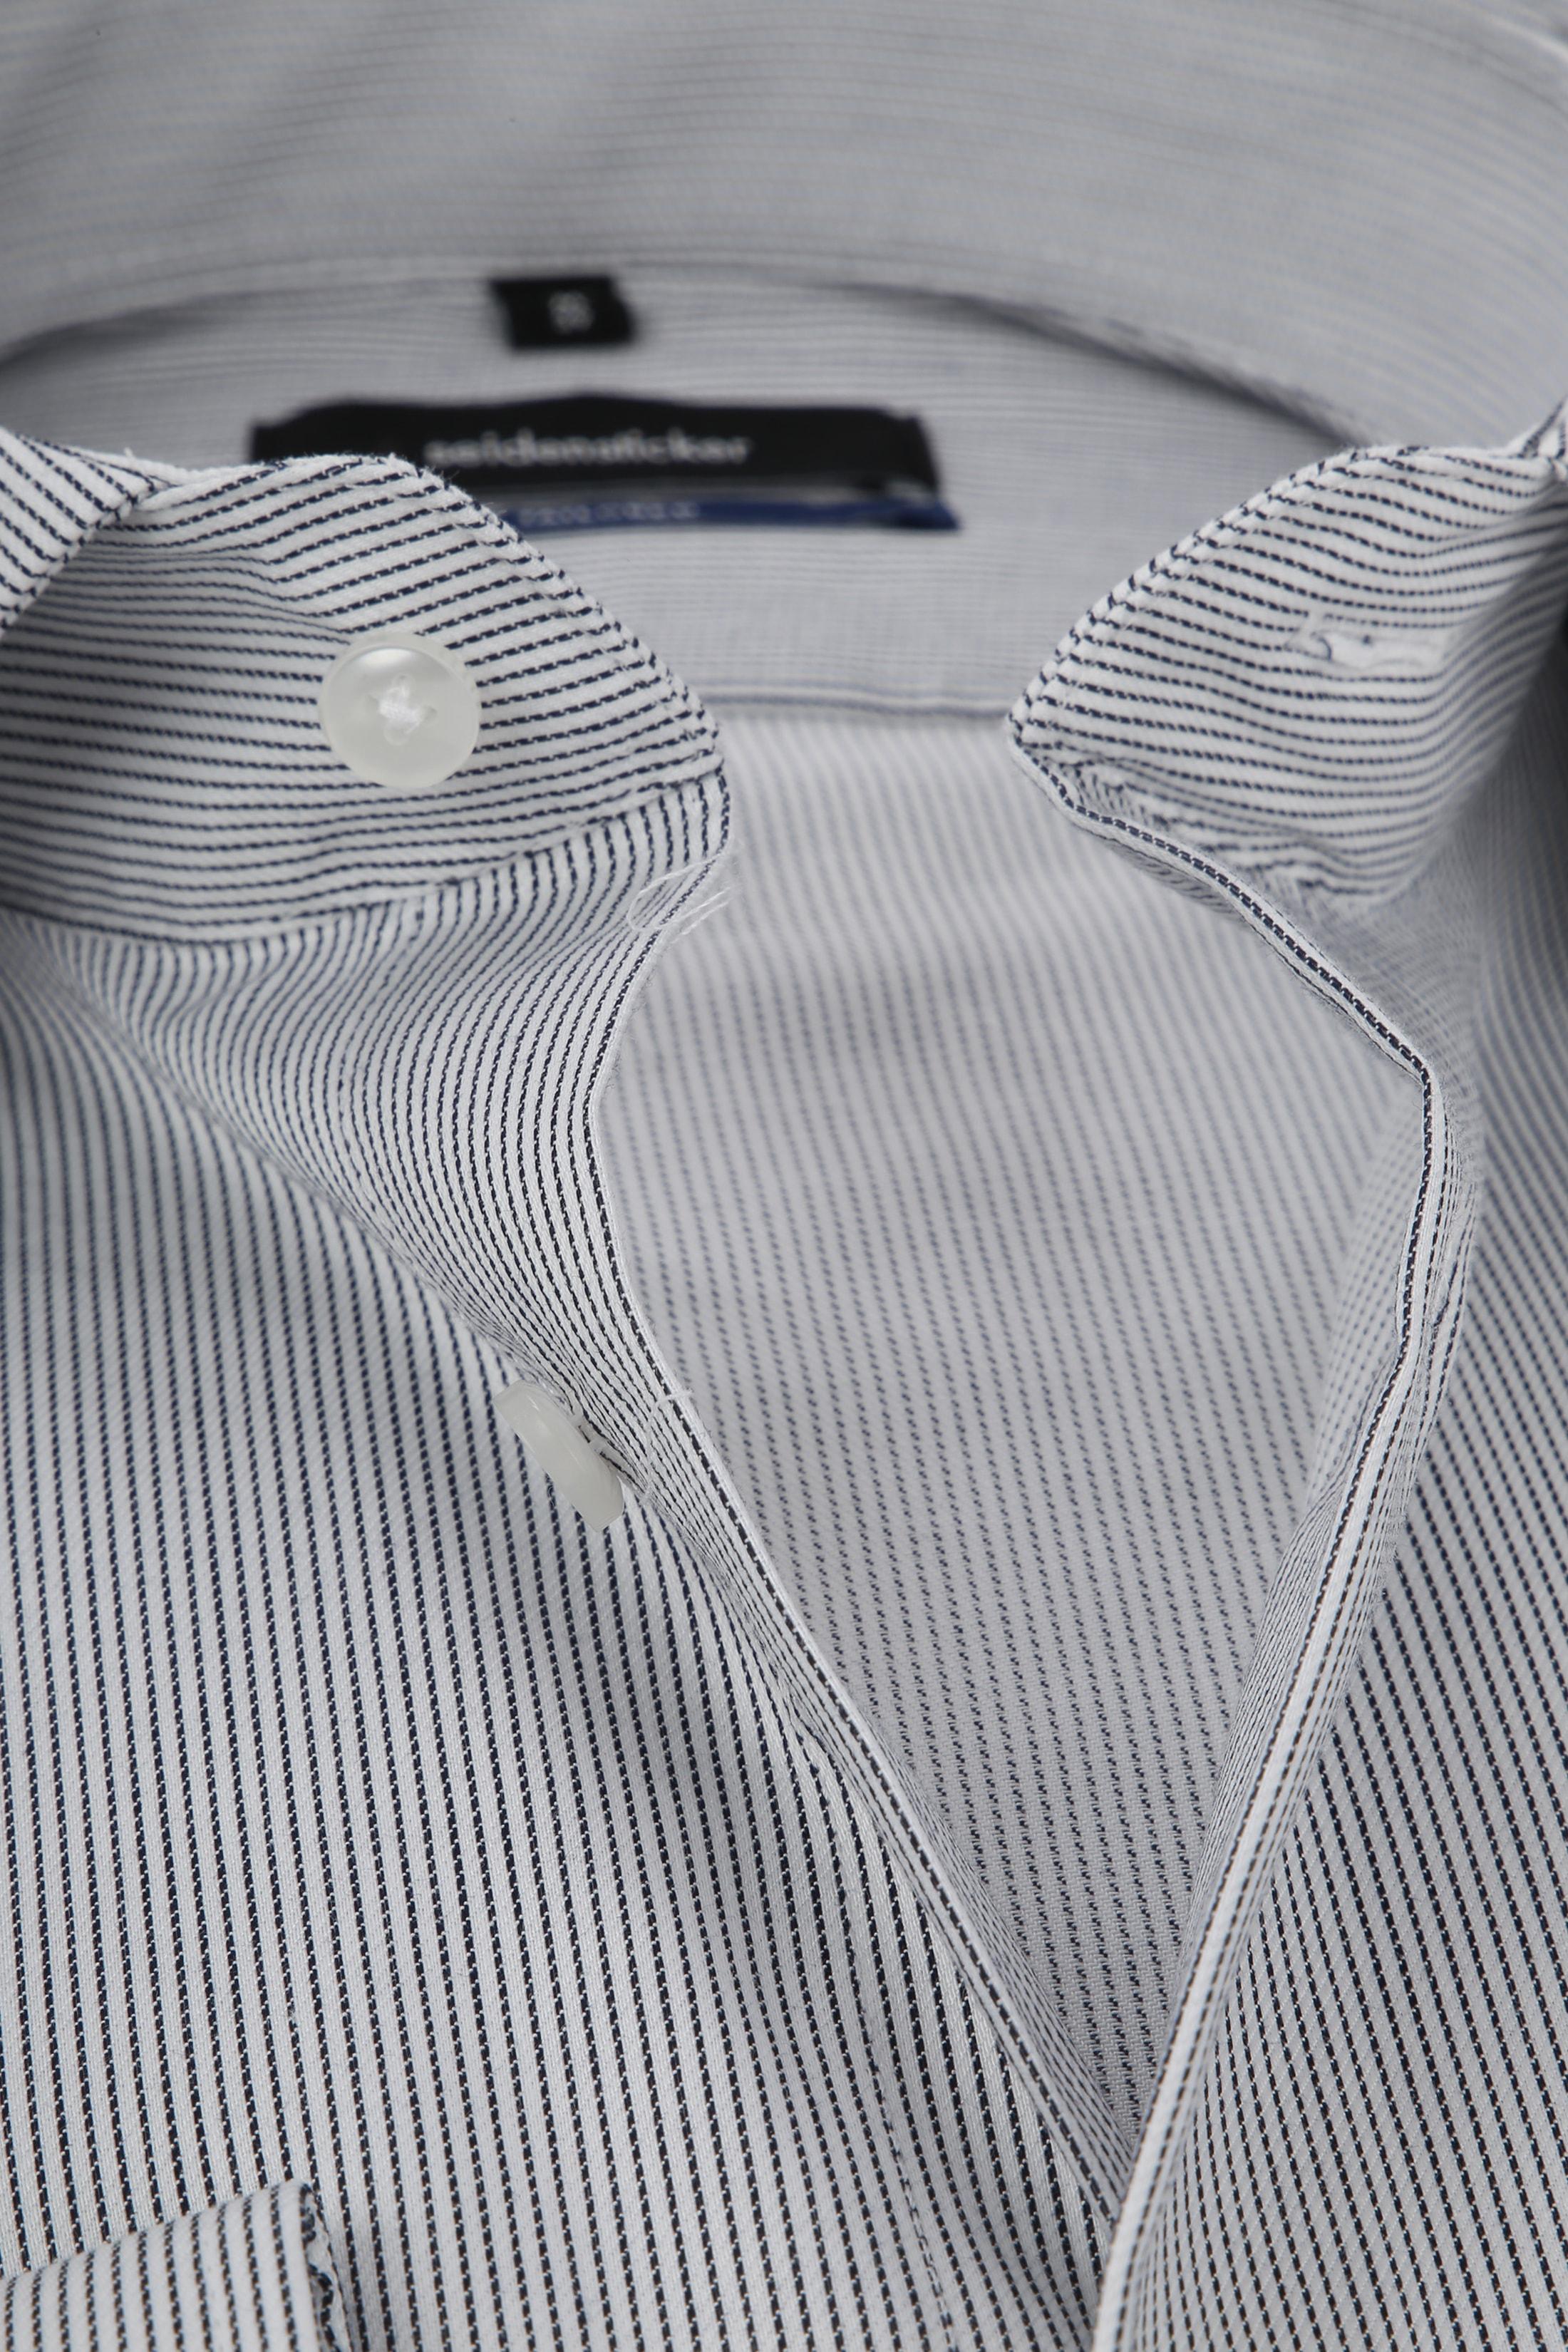 Seidensticker Overhemd Grijs foto 1